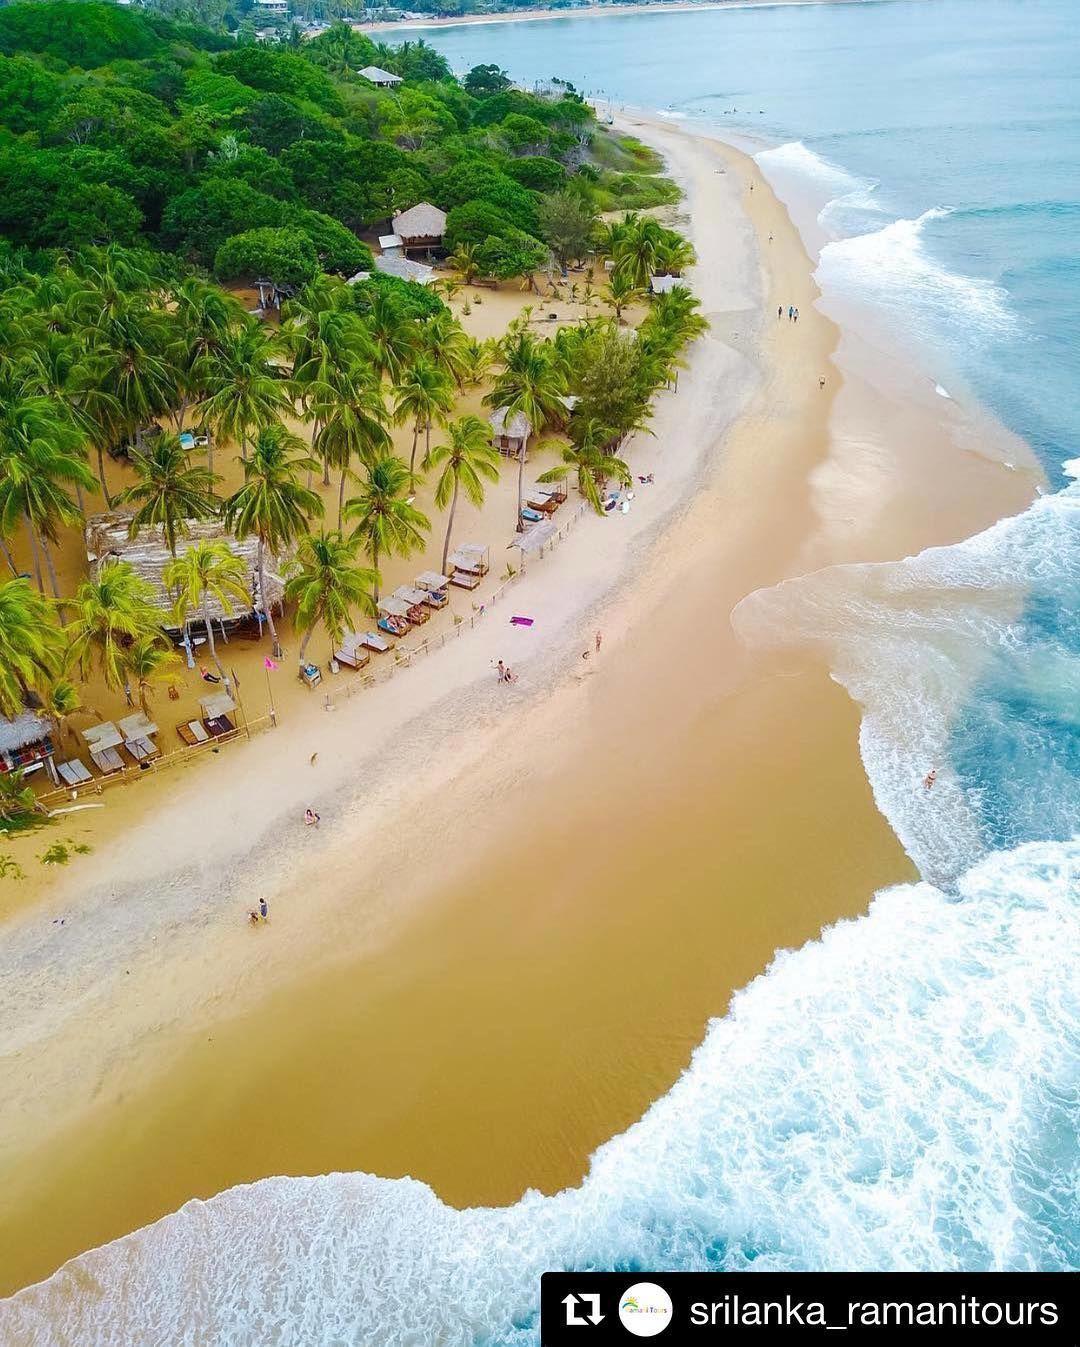 Repost srilanka_ramanitours with get_repost Arugam Bay